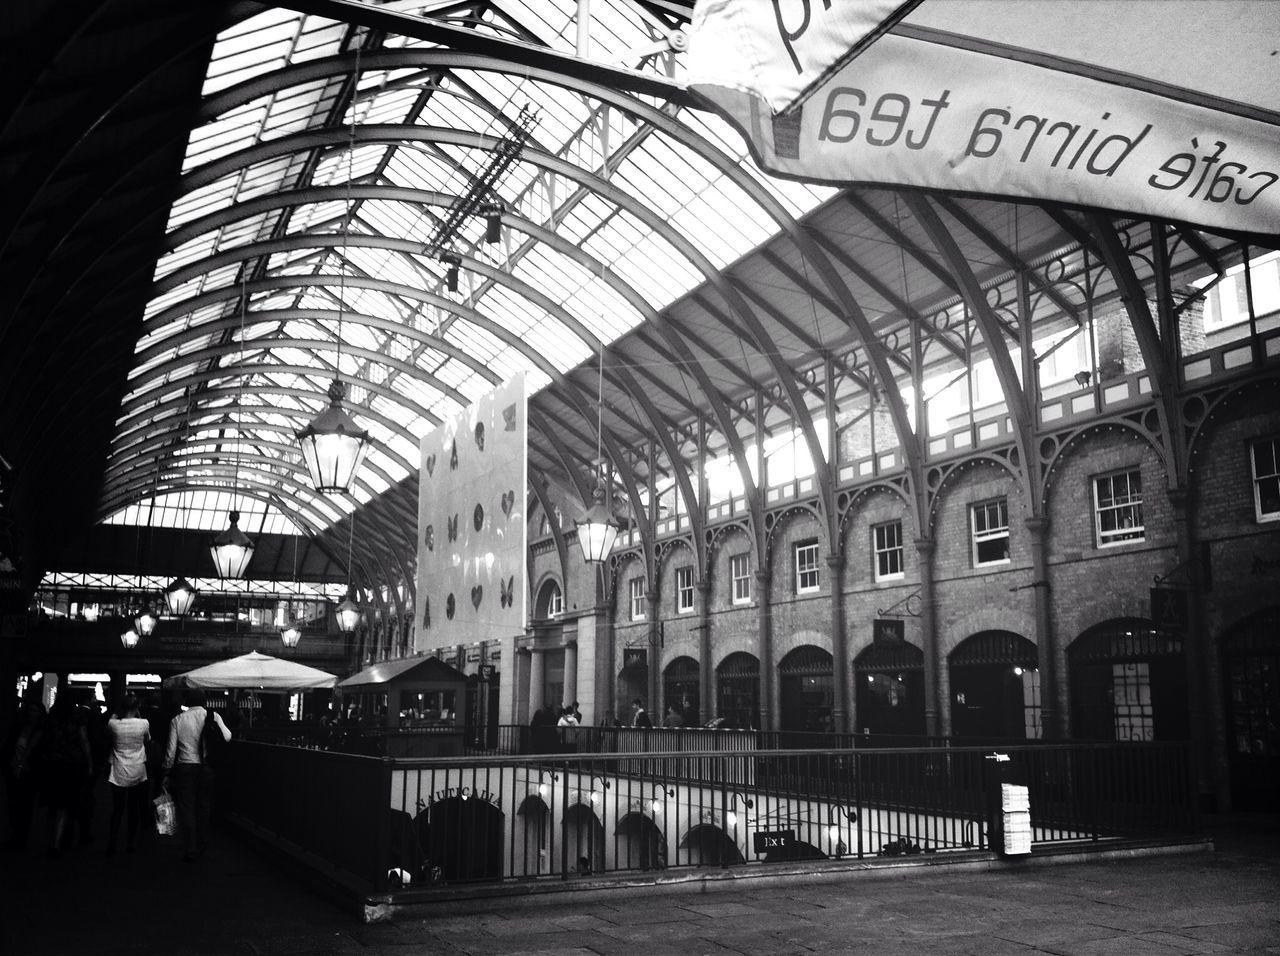 Interior Of Covent Garden Market